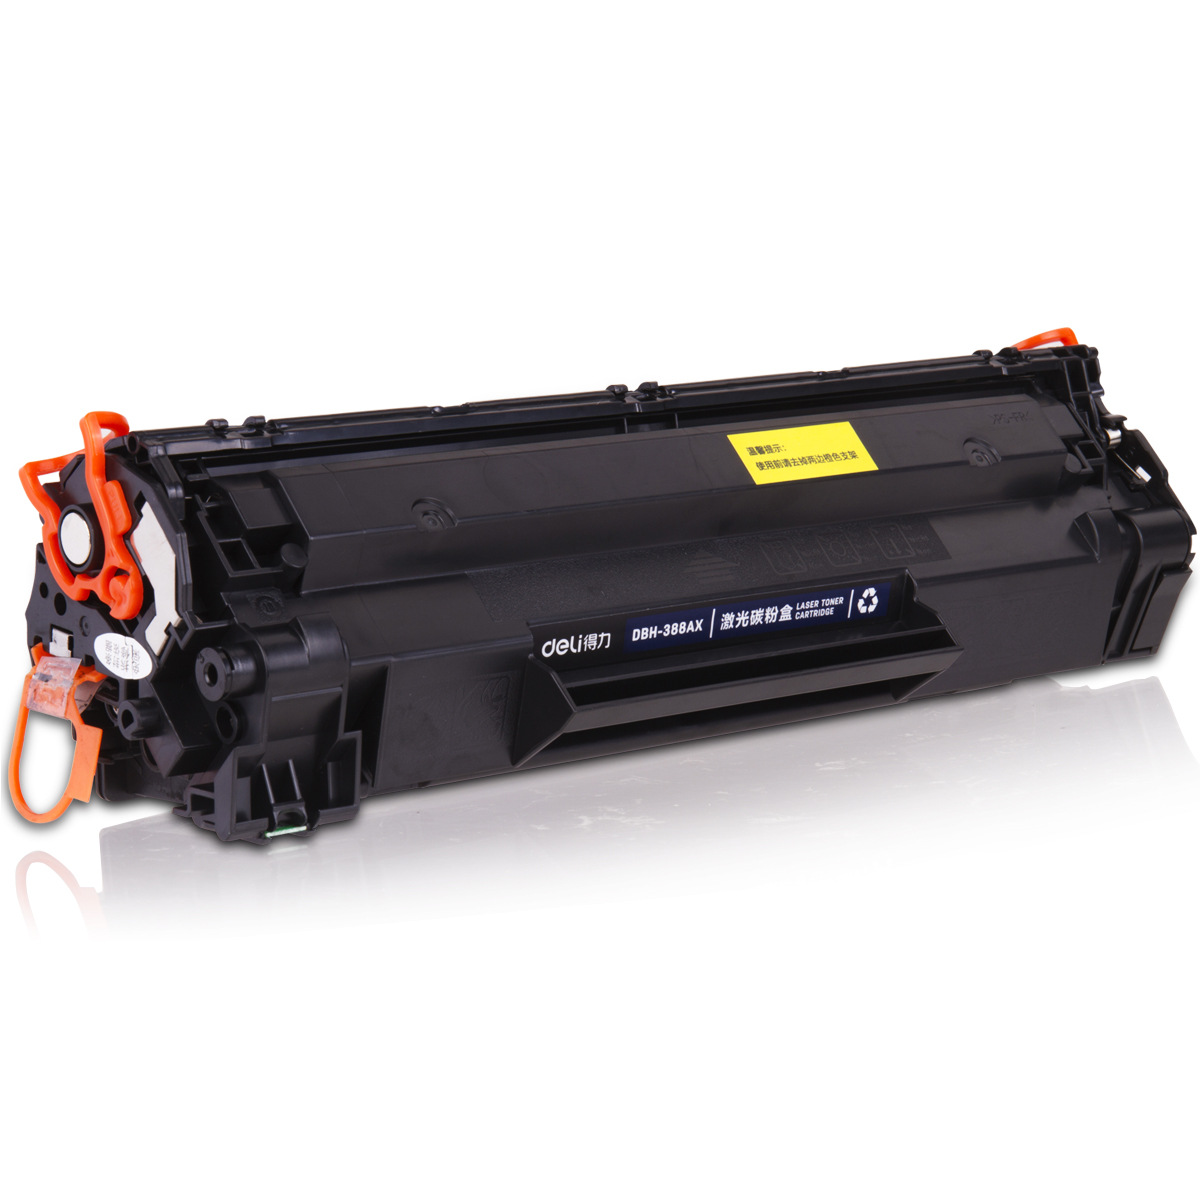 DELI Hộp mực than Hộp mực in laser hiệu quả Hộp mực DBH-388AX2 cho hộp mực HP P1007 / P1008 / P1106